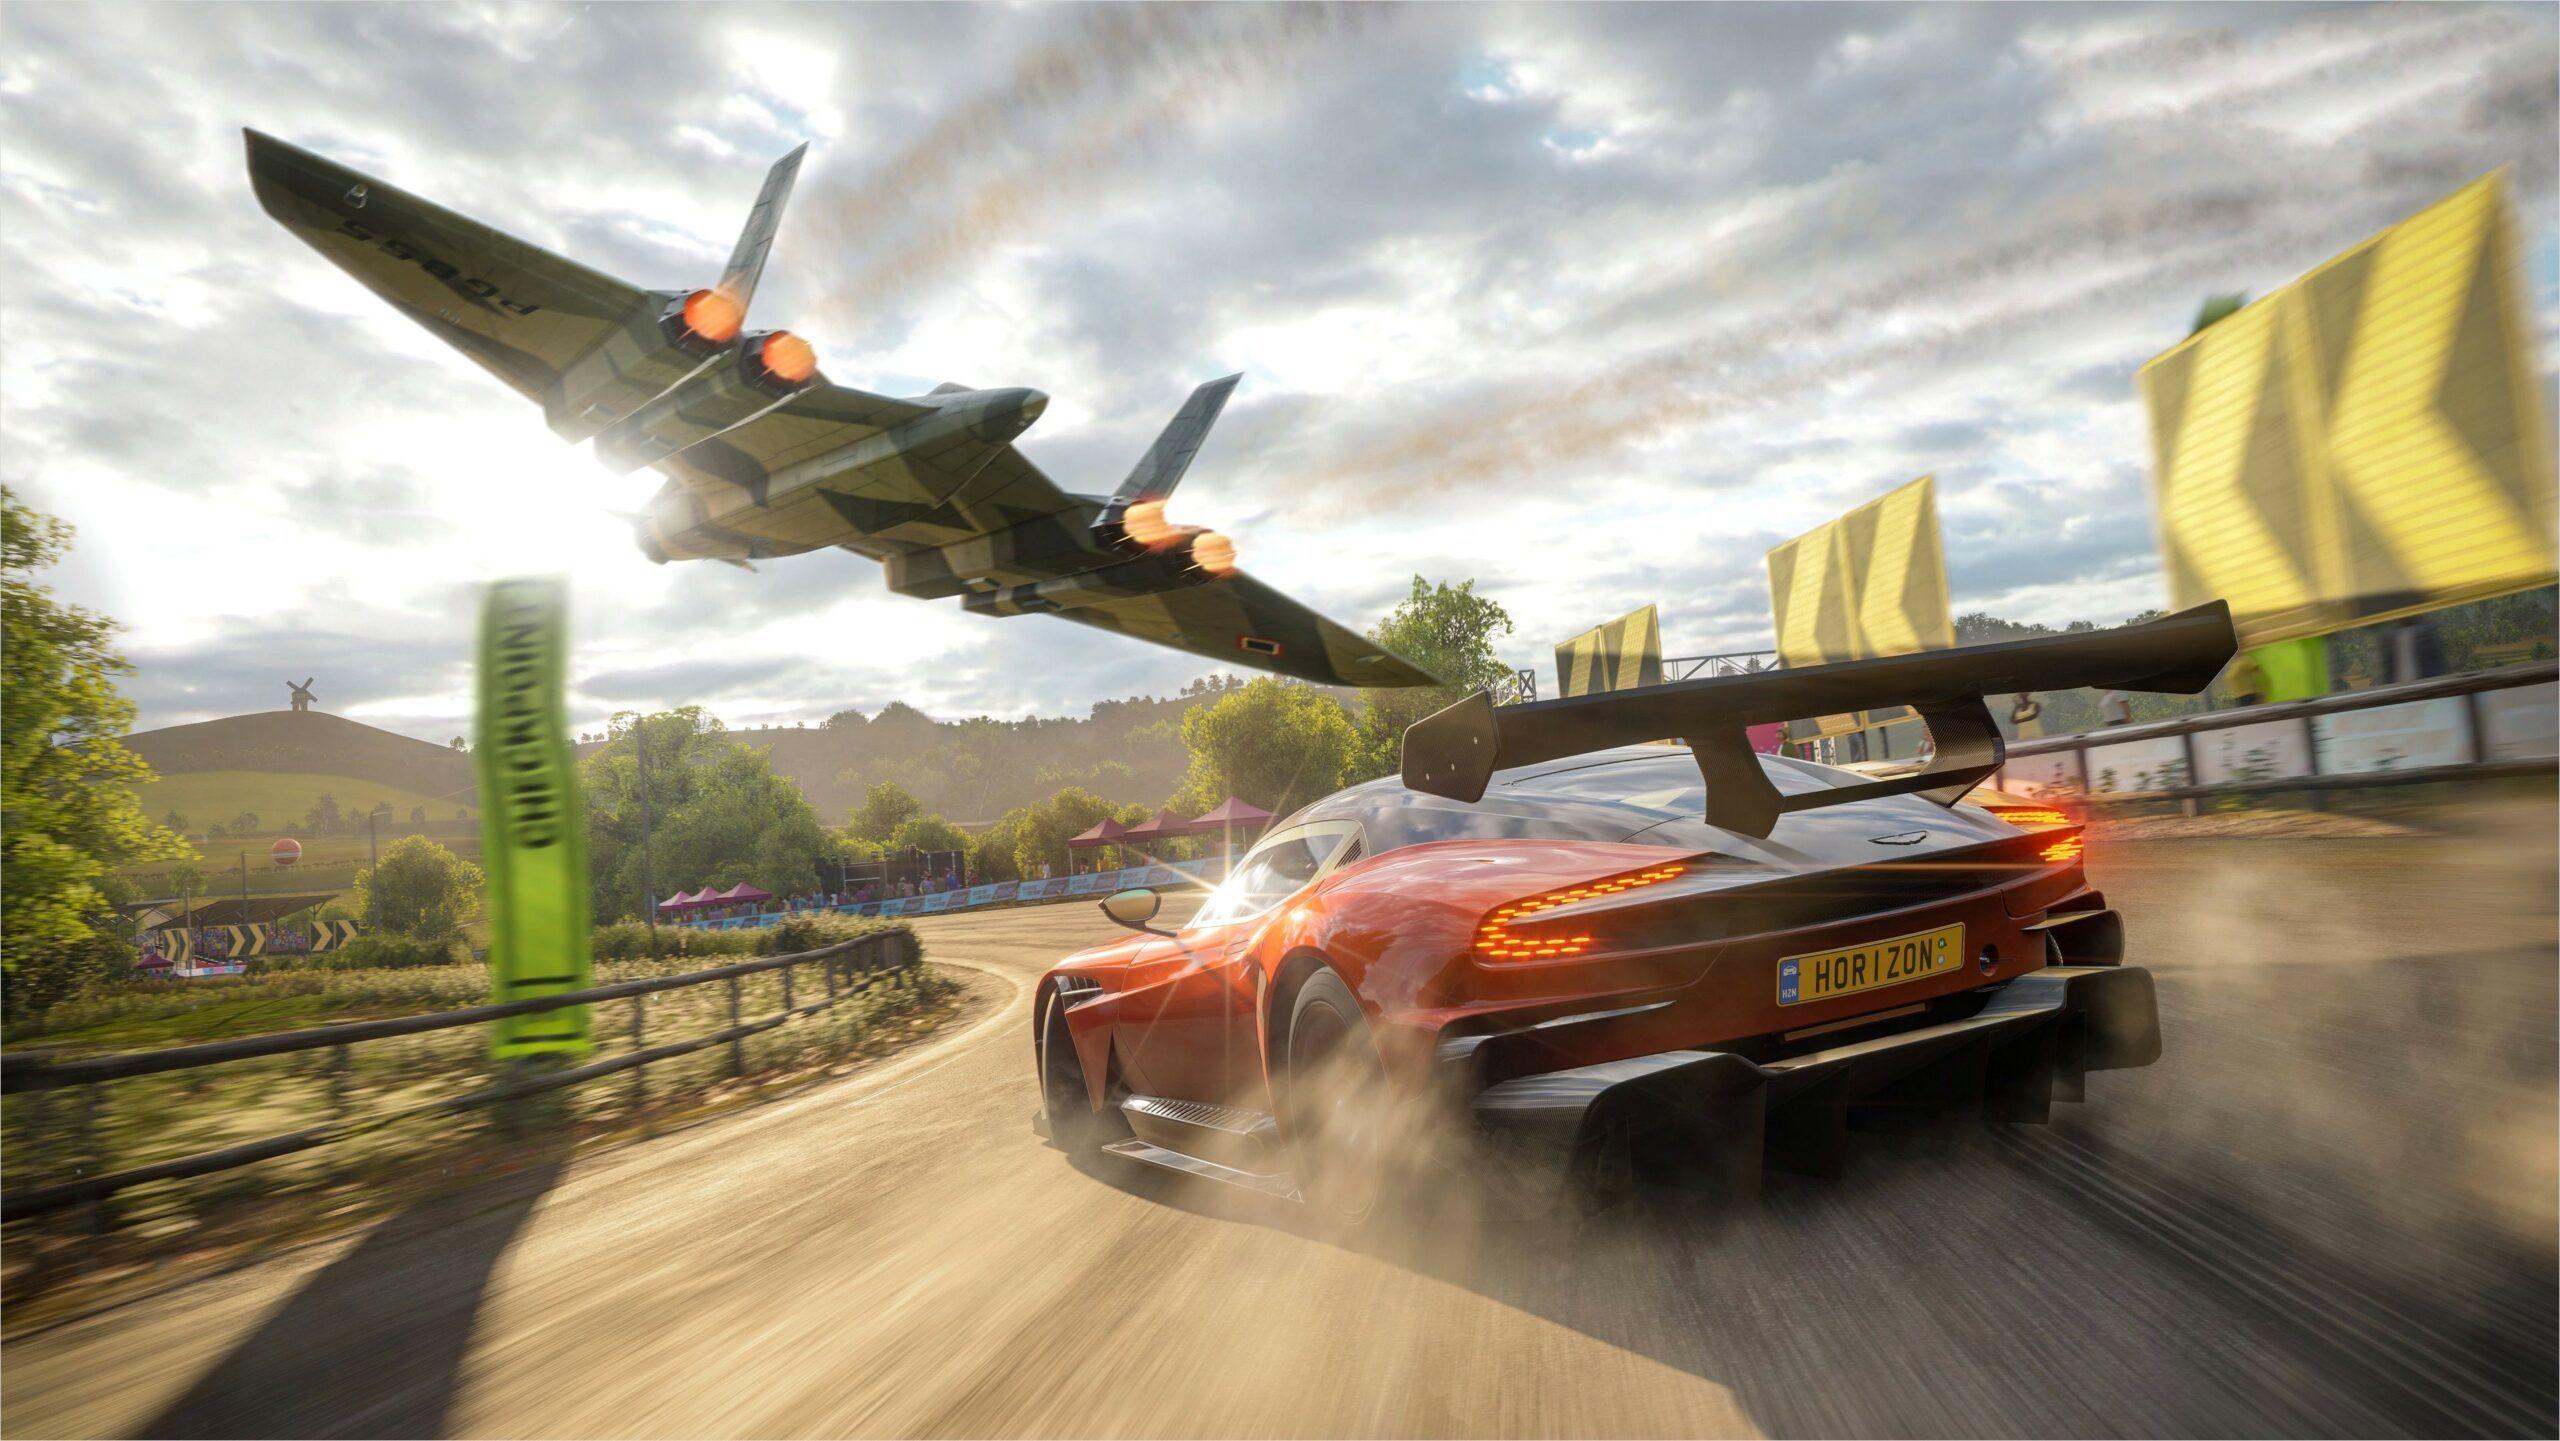 4k Car Wallpaper Foraza Horizon In 2020 Forza Horizon Forza